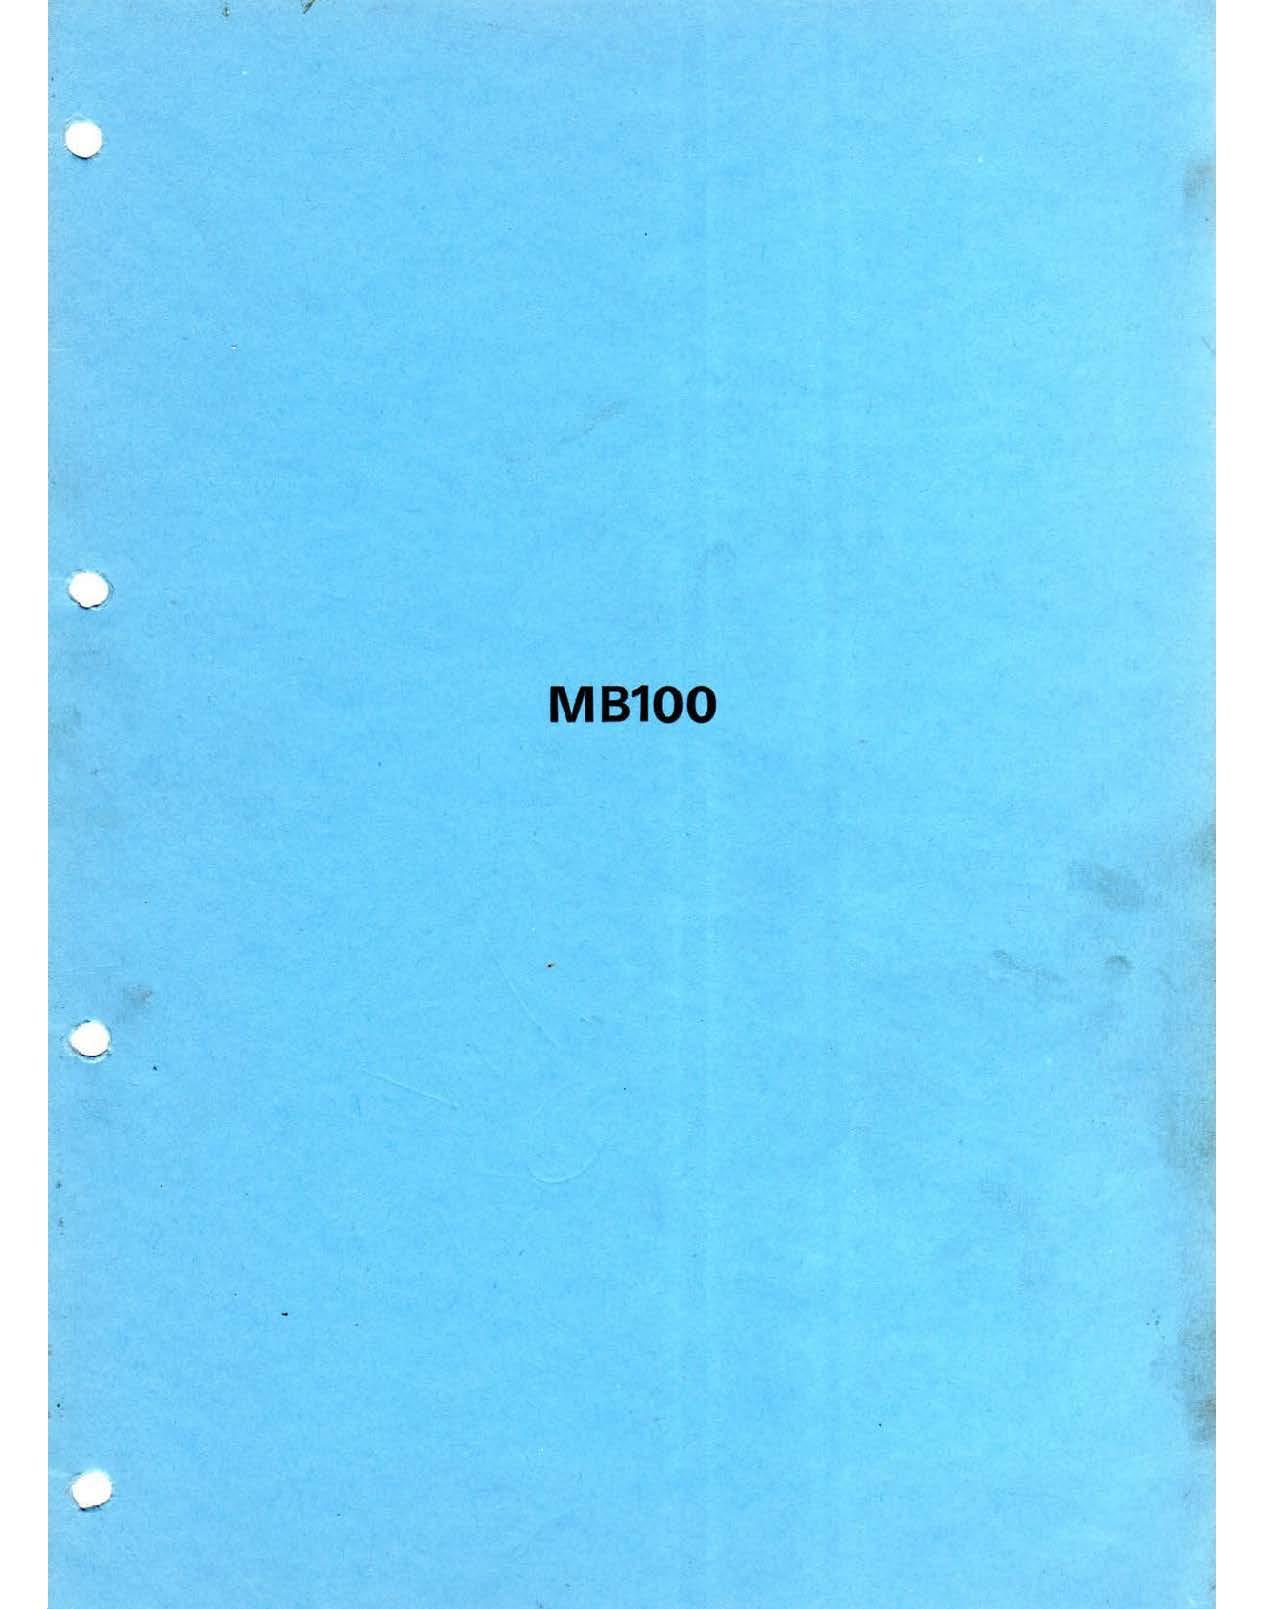 Workshop manual for Honda MB100